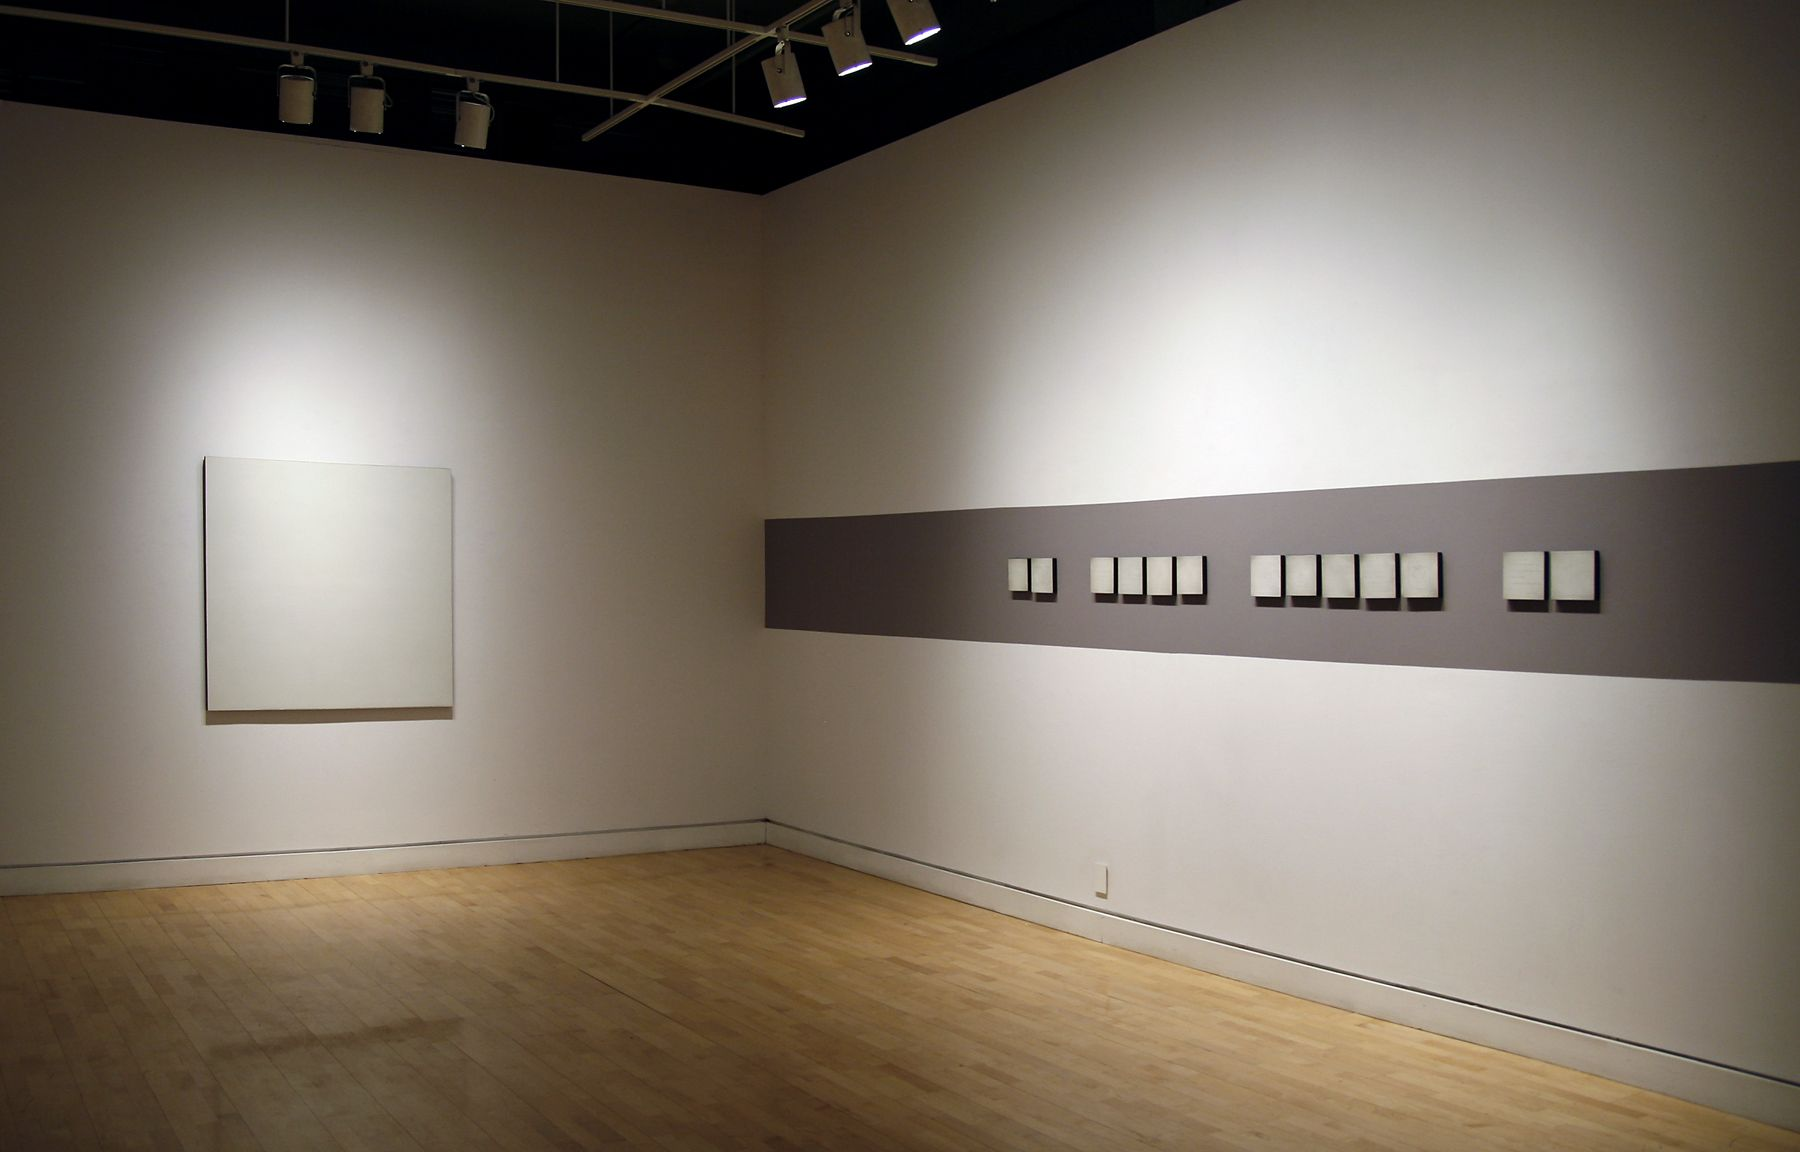 Thomas Chimes Entropy Paintings